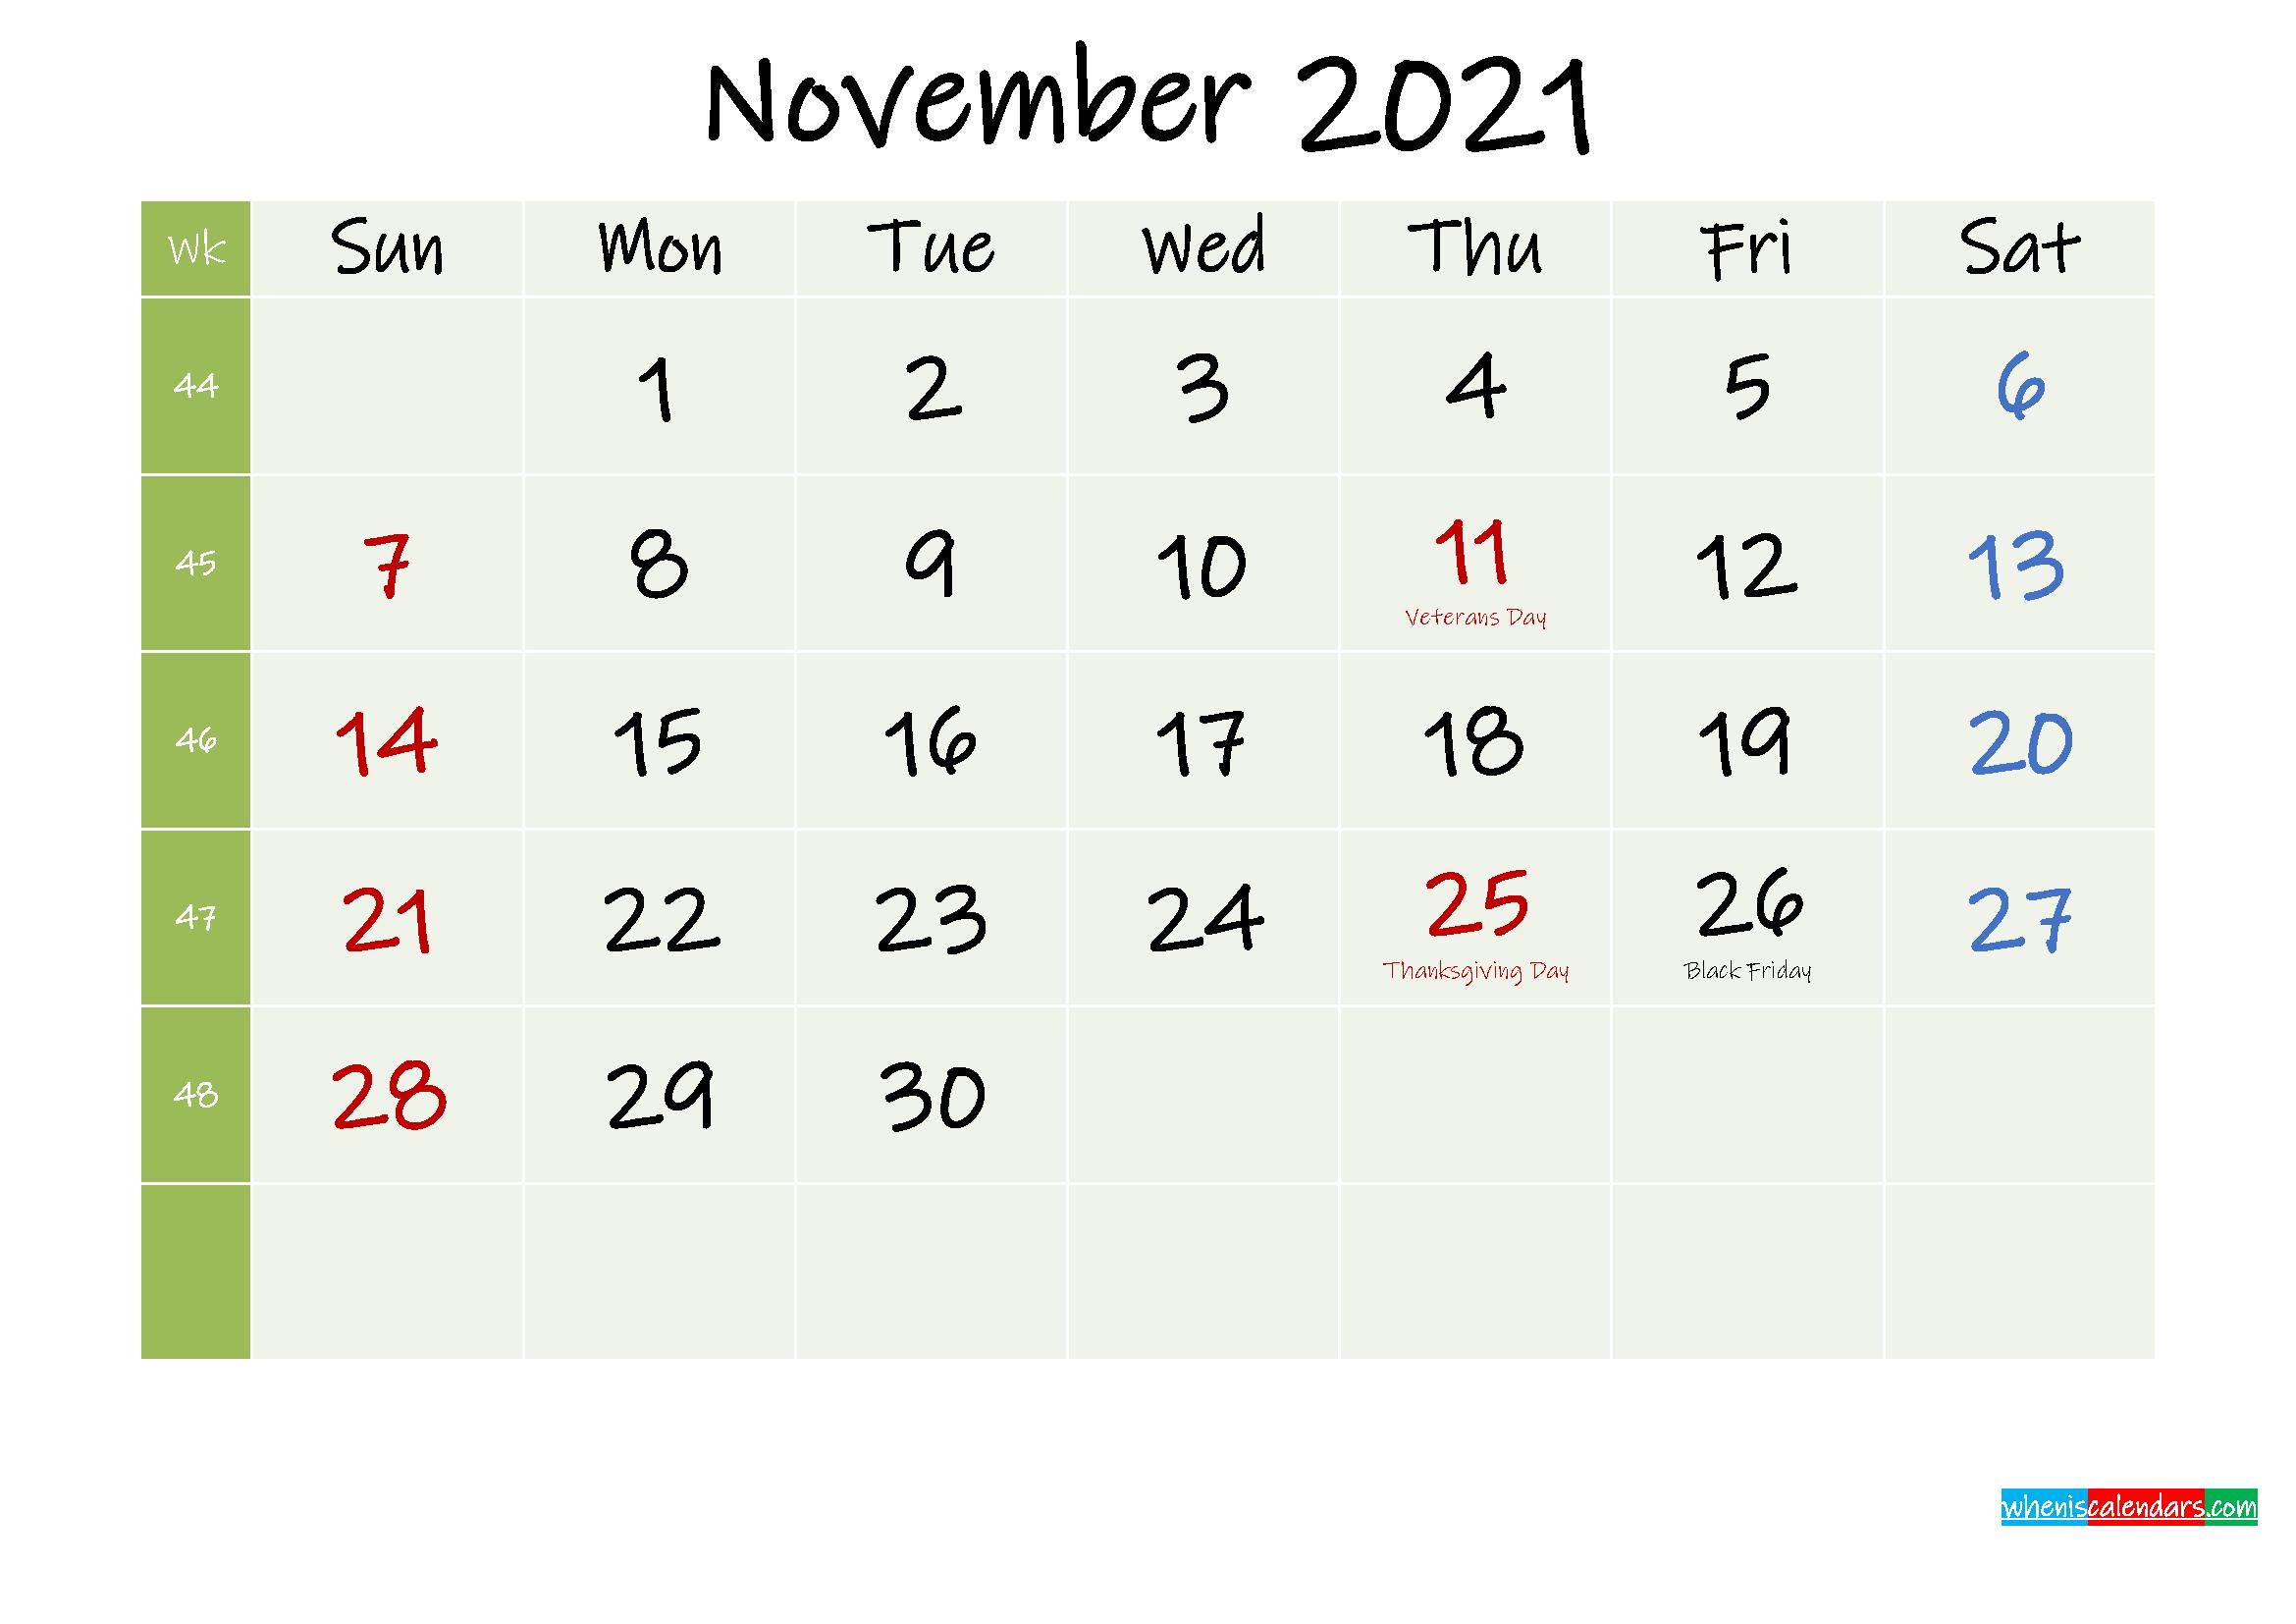 November 2021 Calendar with Holidays Printable